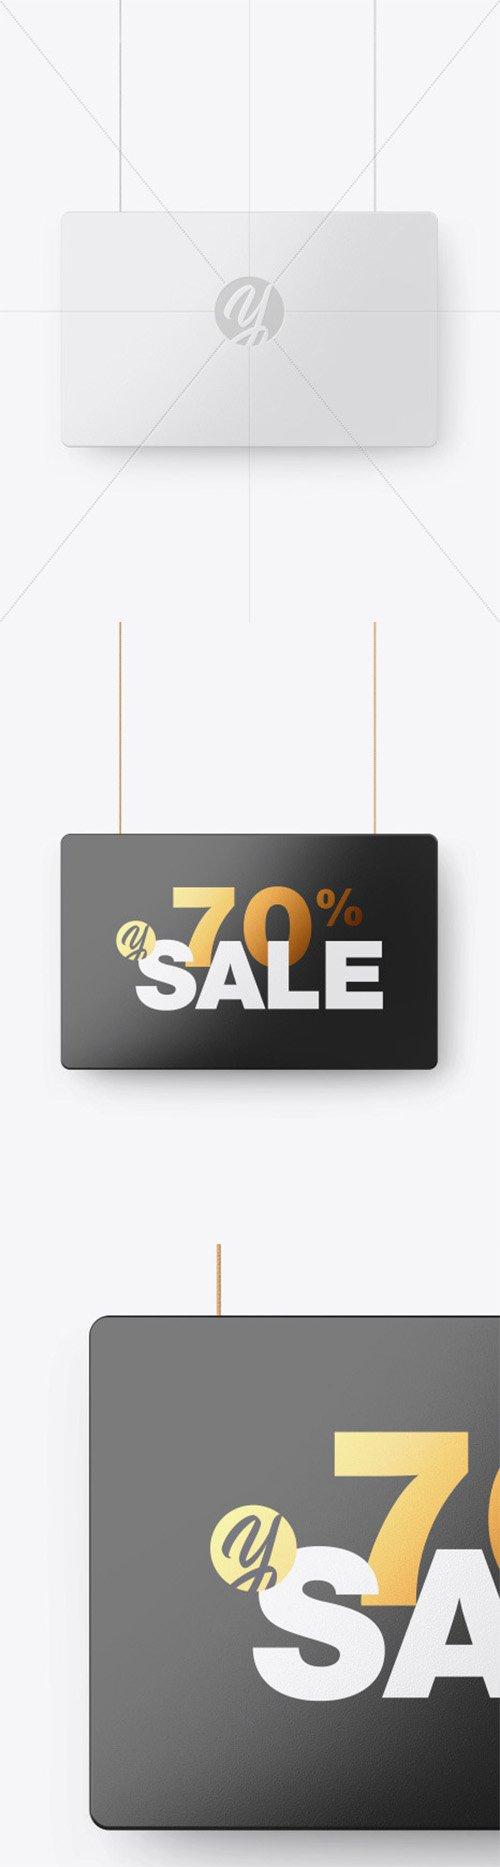 Glossy Discount Sign Mockup 56166 TIF